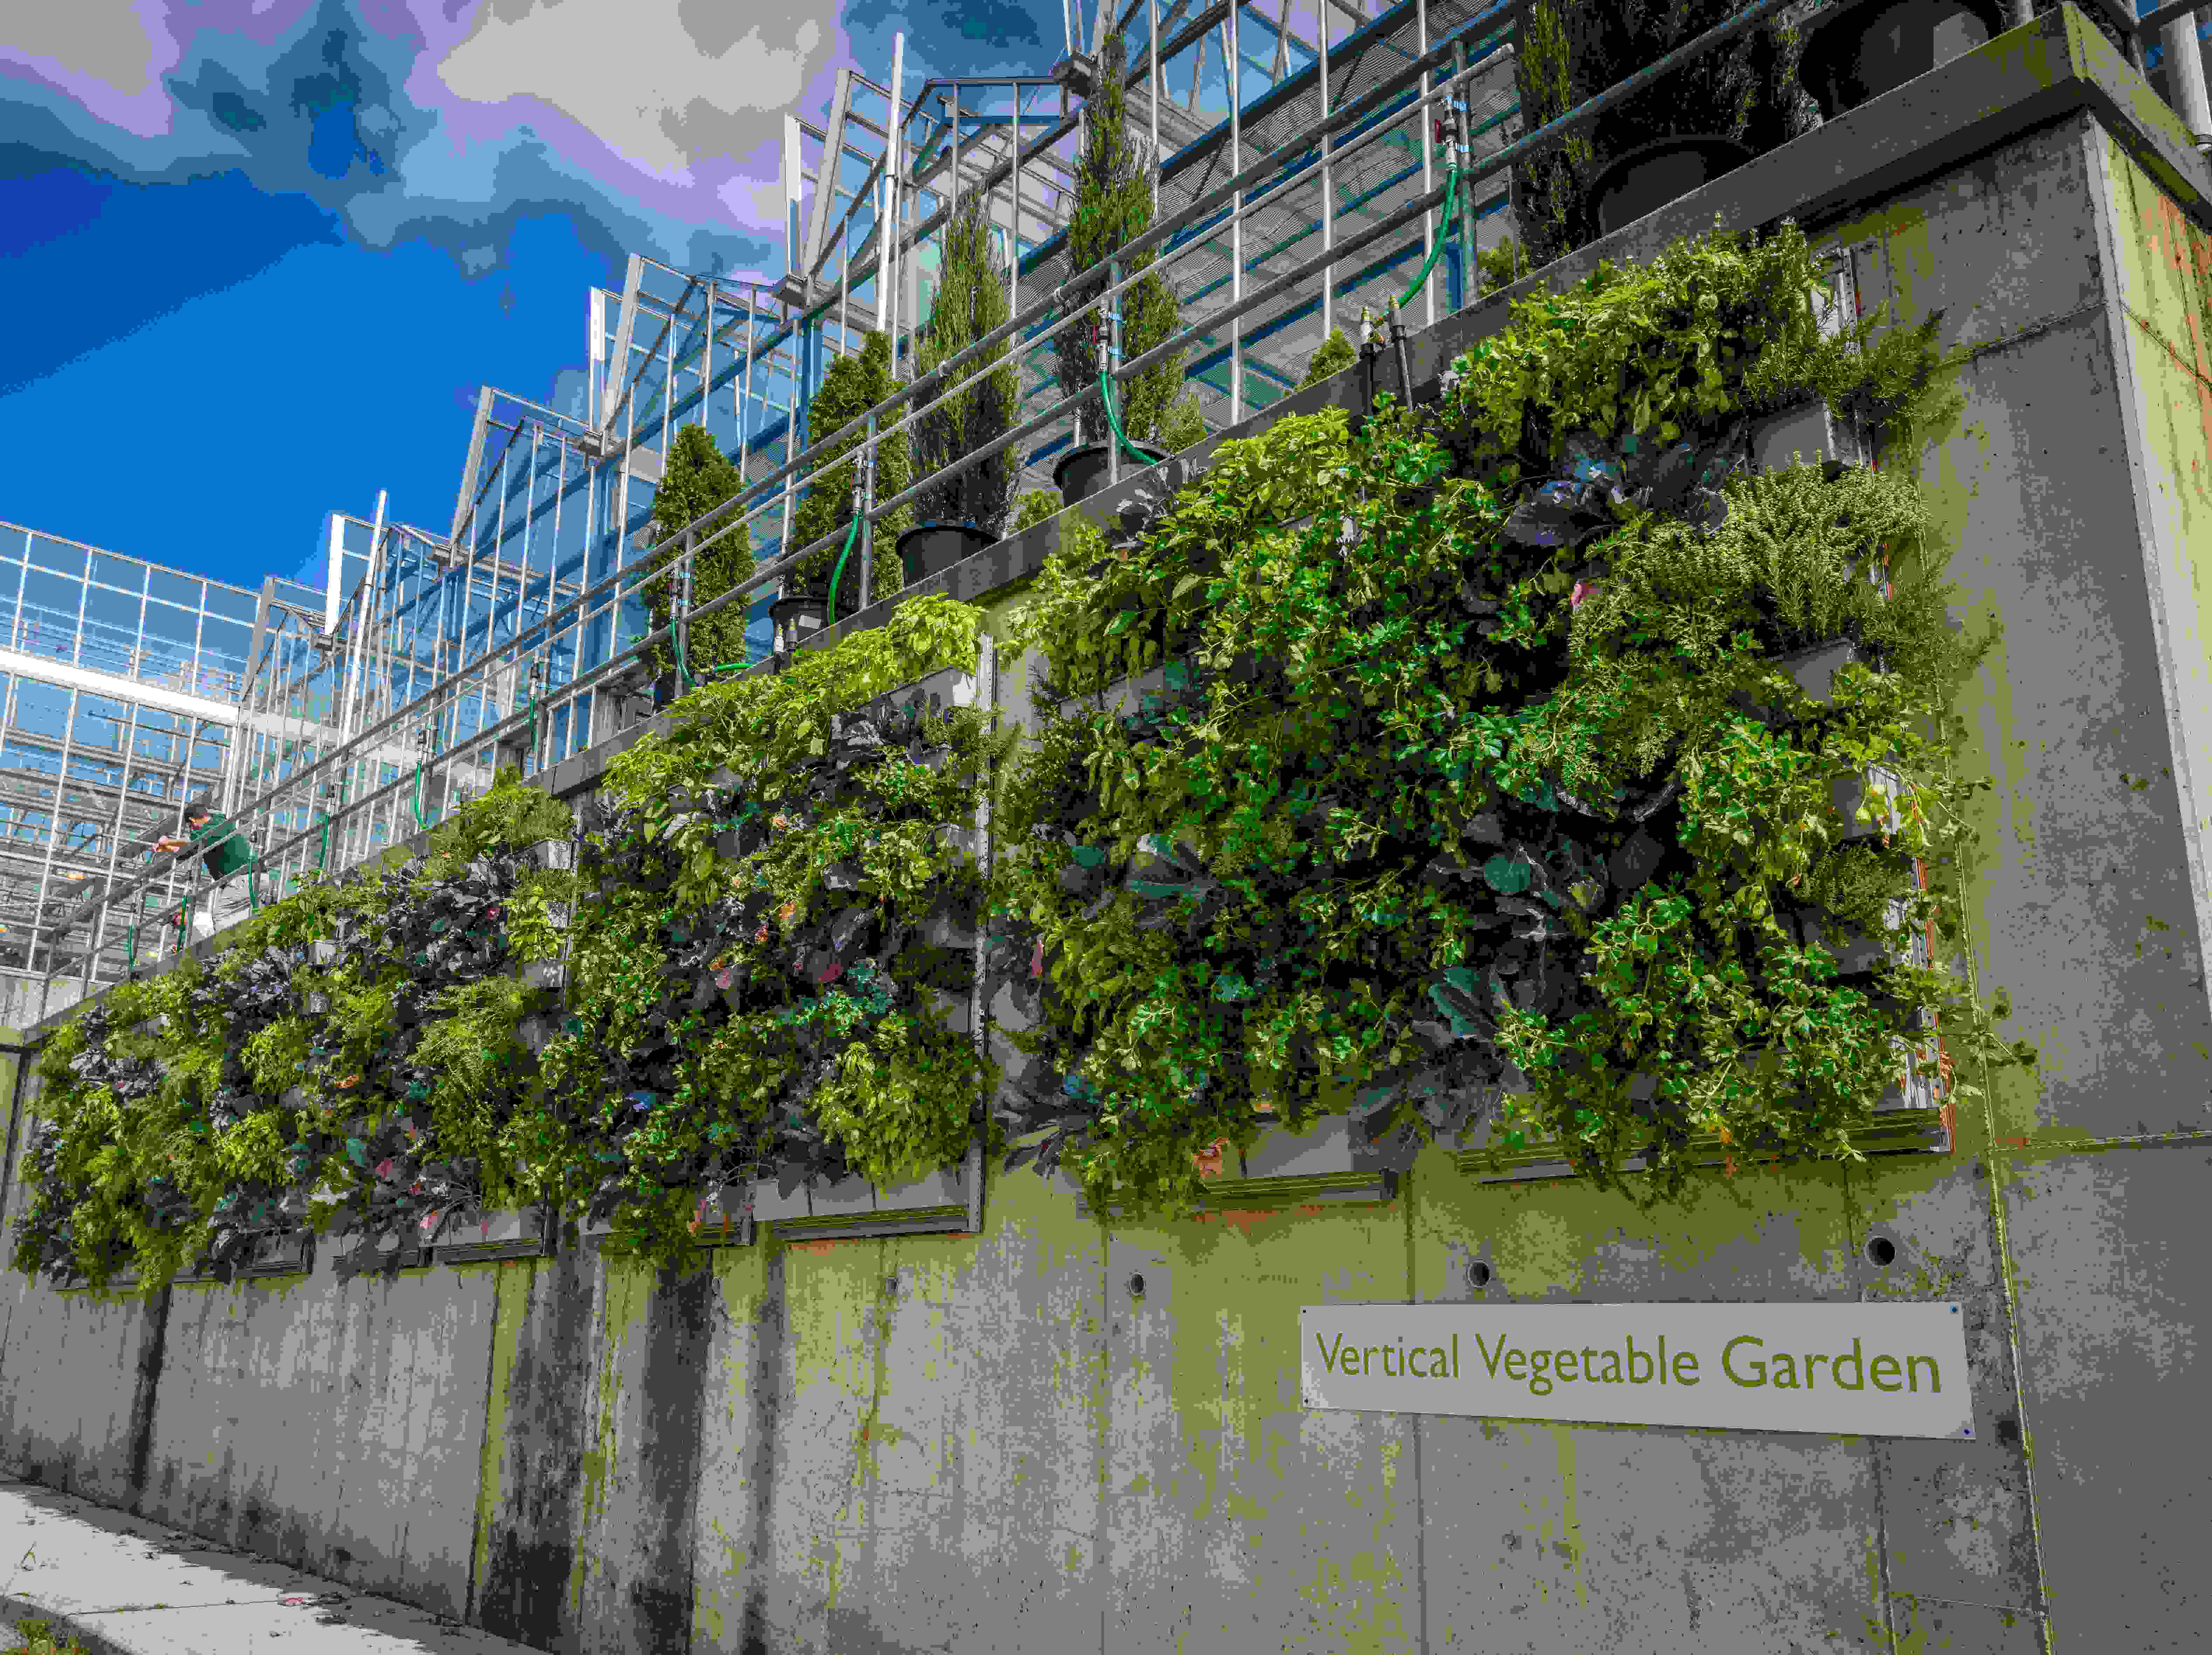 curved modern edibles favorite raised beginners vegetable vertical design bed garden sunset pea ideas designs for magazine hardscaping